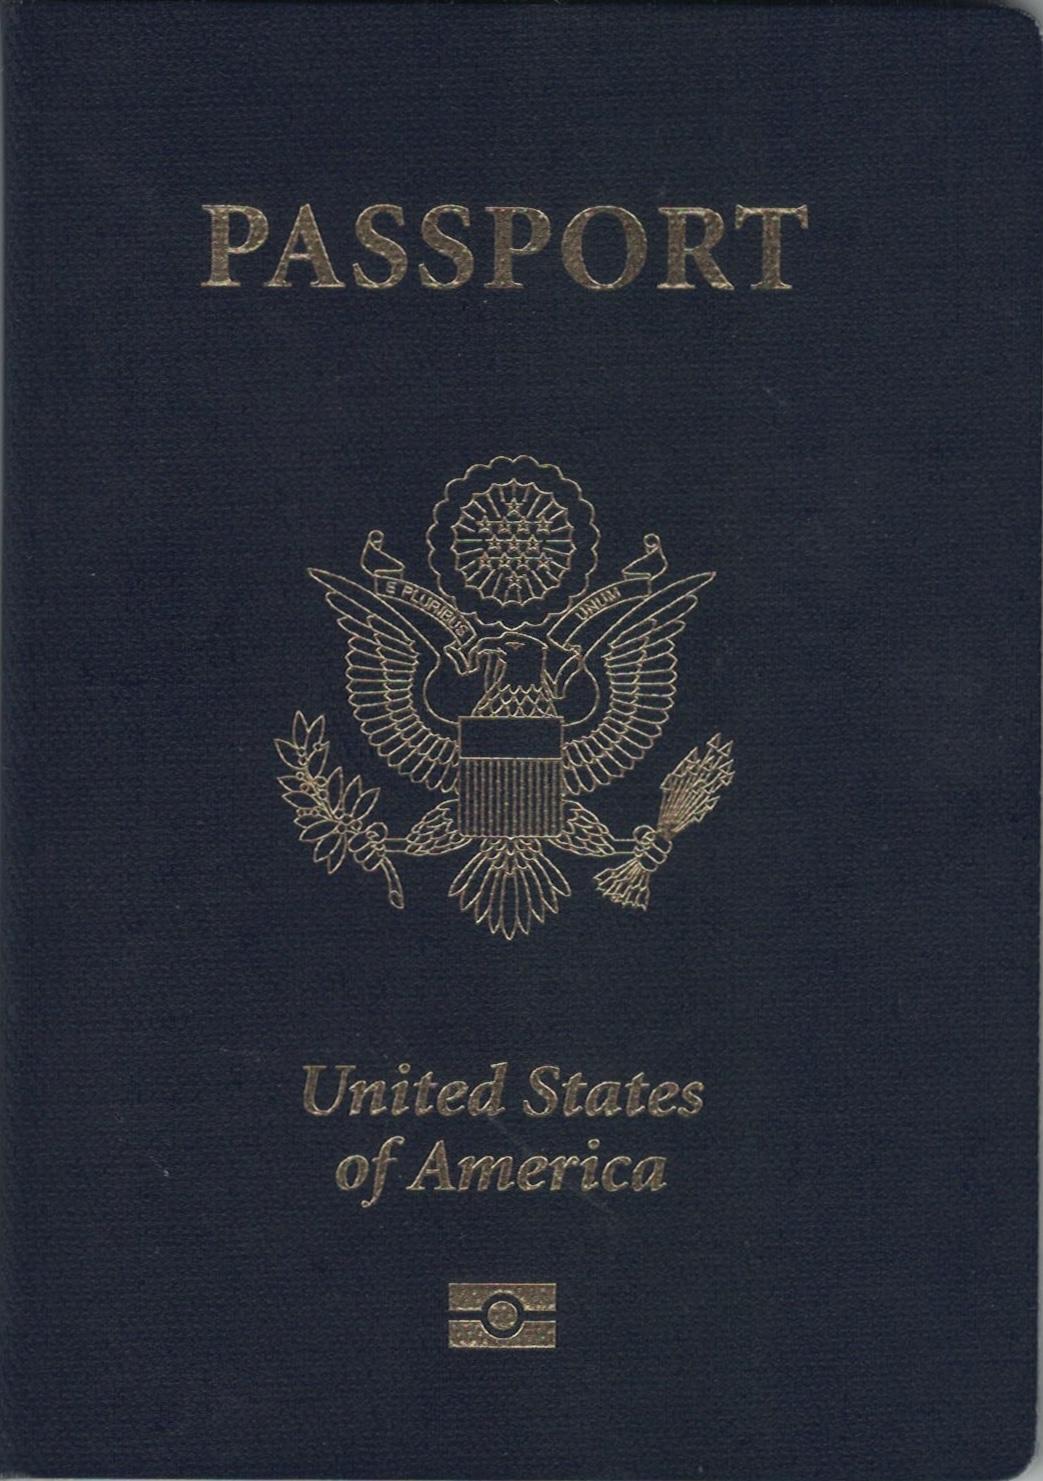 https://i1.wp.com/upload.wikimedia.org/wikipedia/commons/3/35/Us-passport.jpg